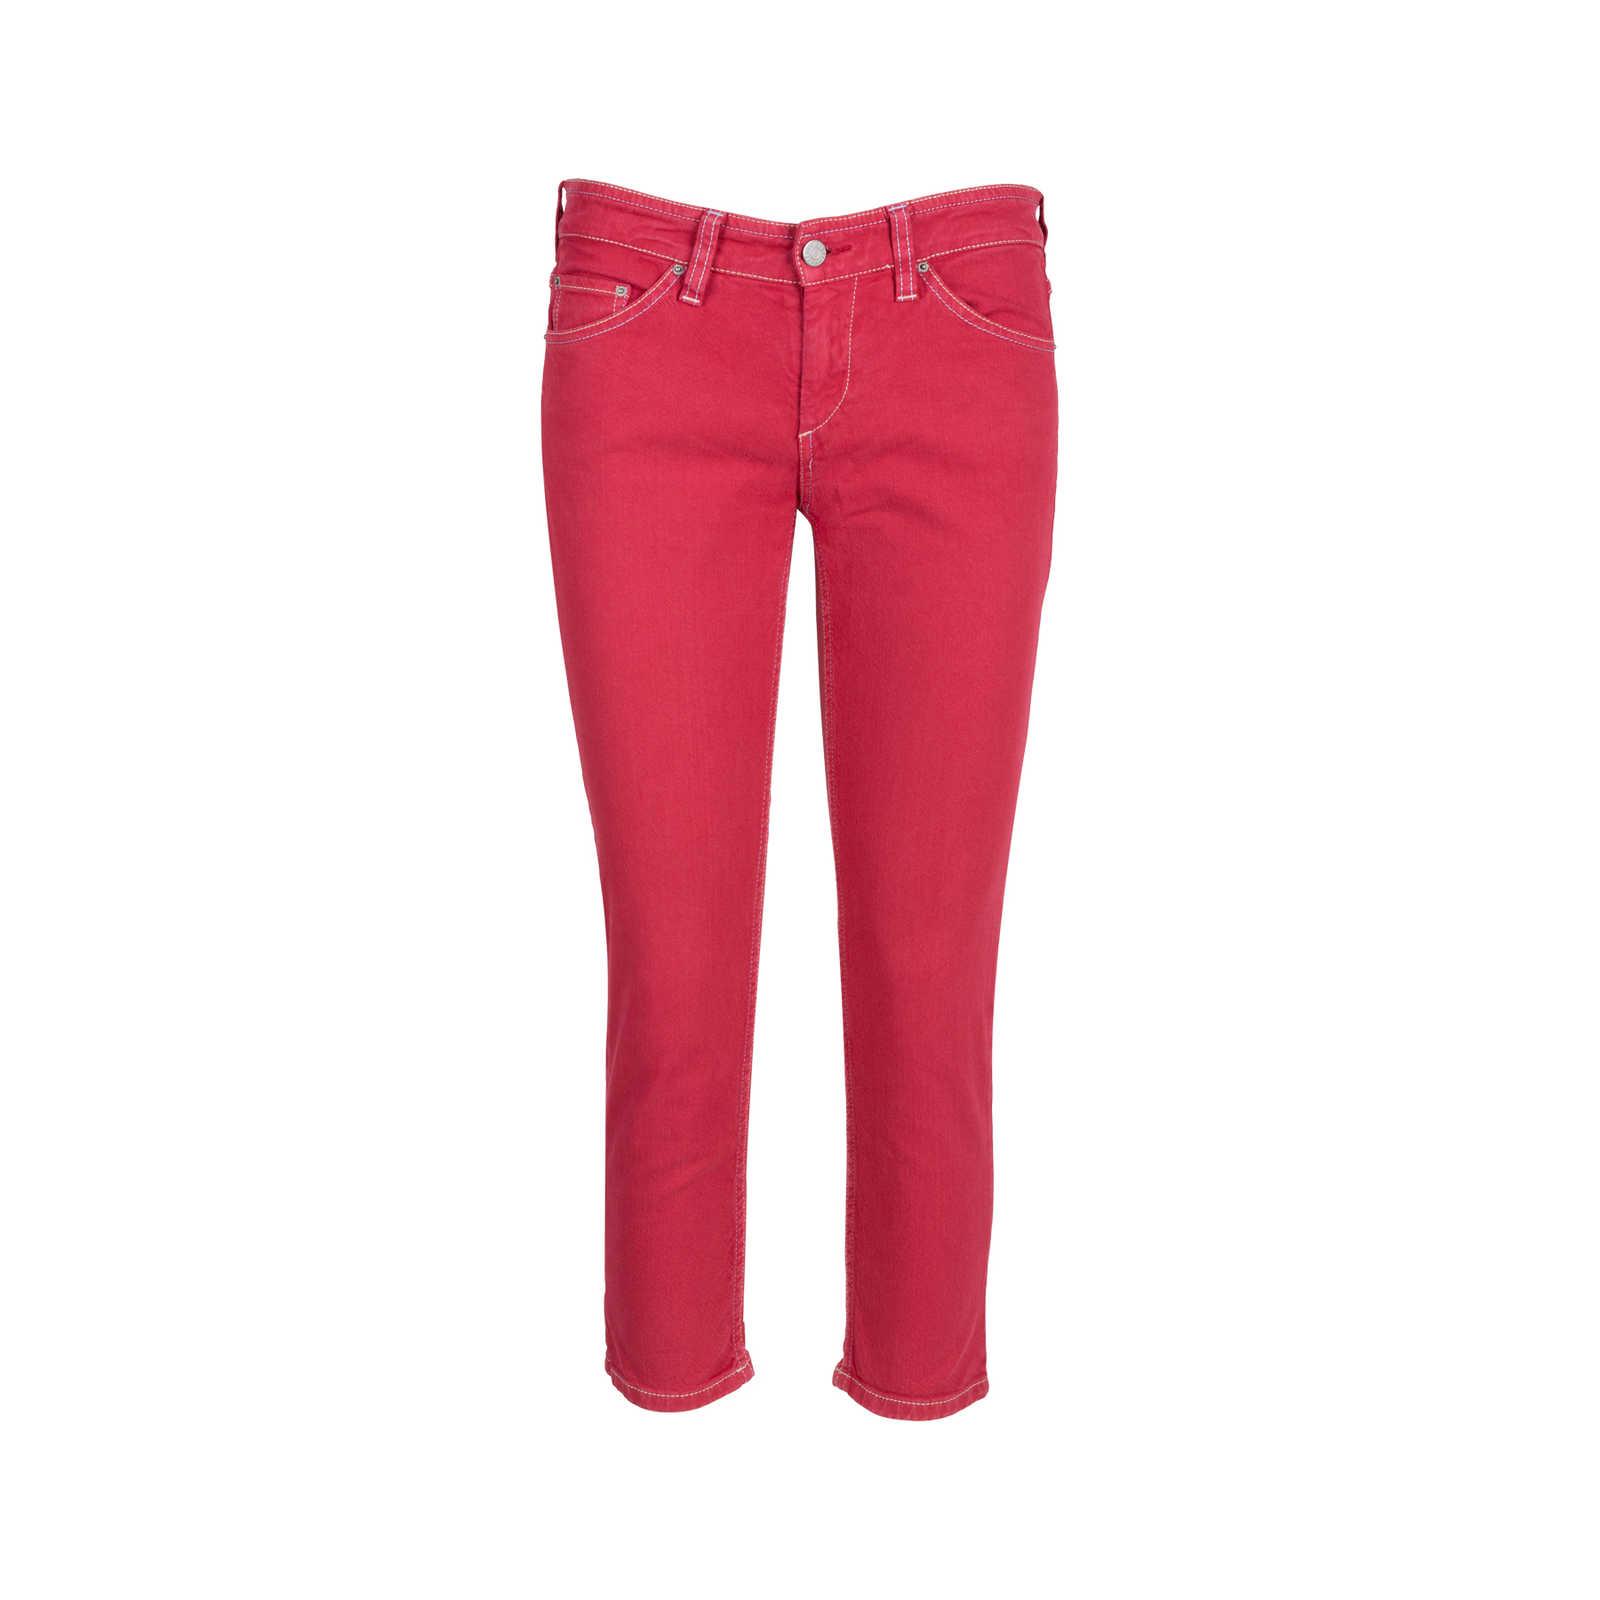 236a0ceb664 Authentic Second Hand Isabel Marant Étoile Multicoloured Stitch Denim Jeans  (PSS-126-00129 ...